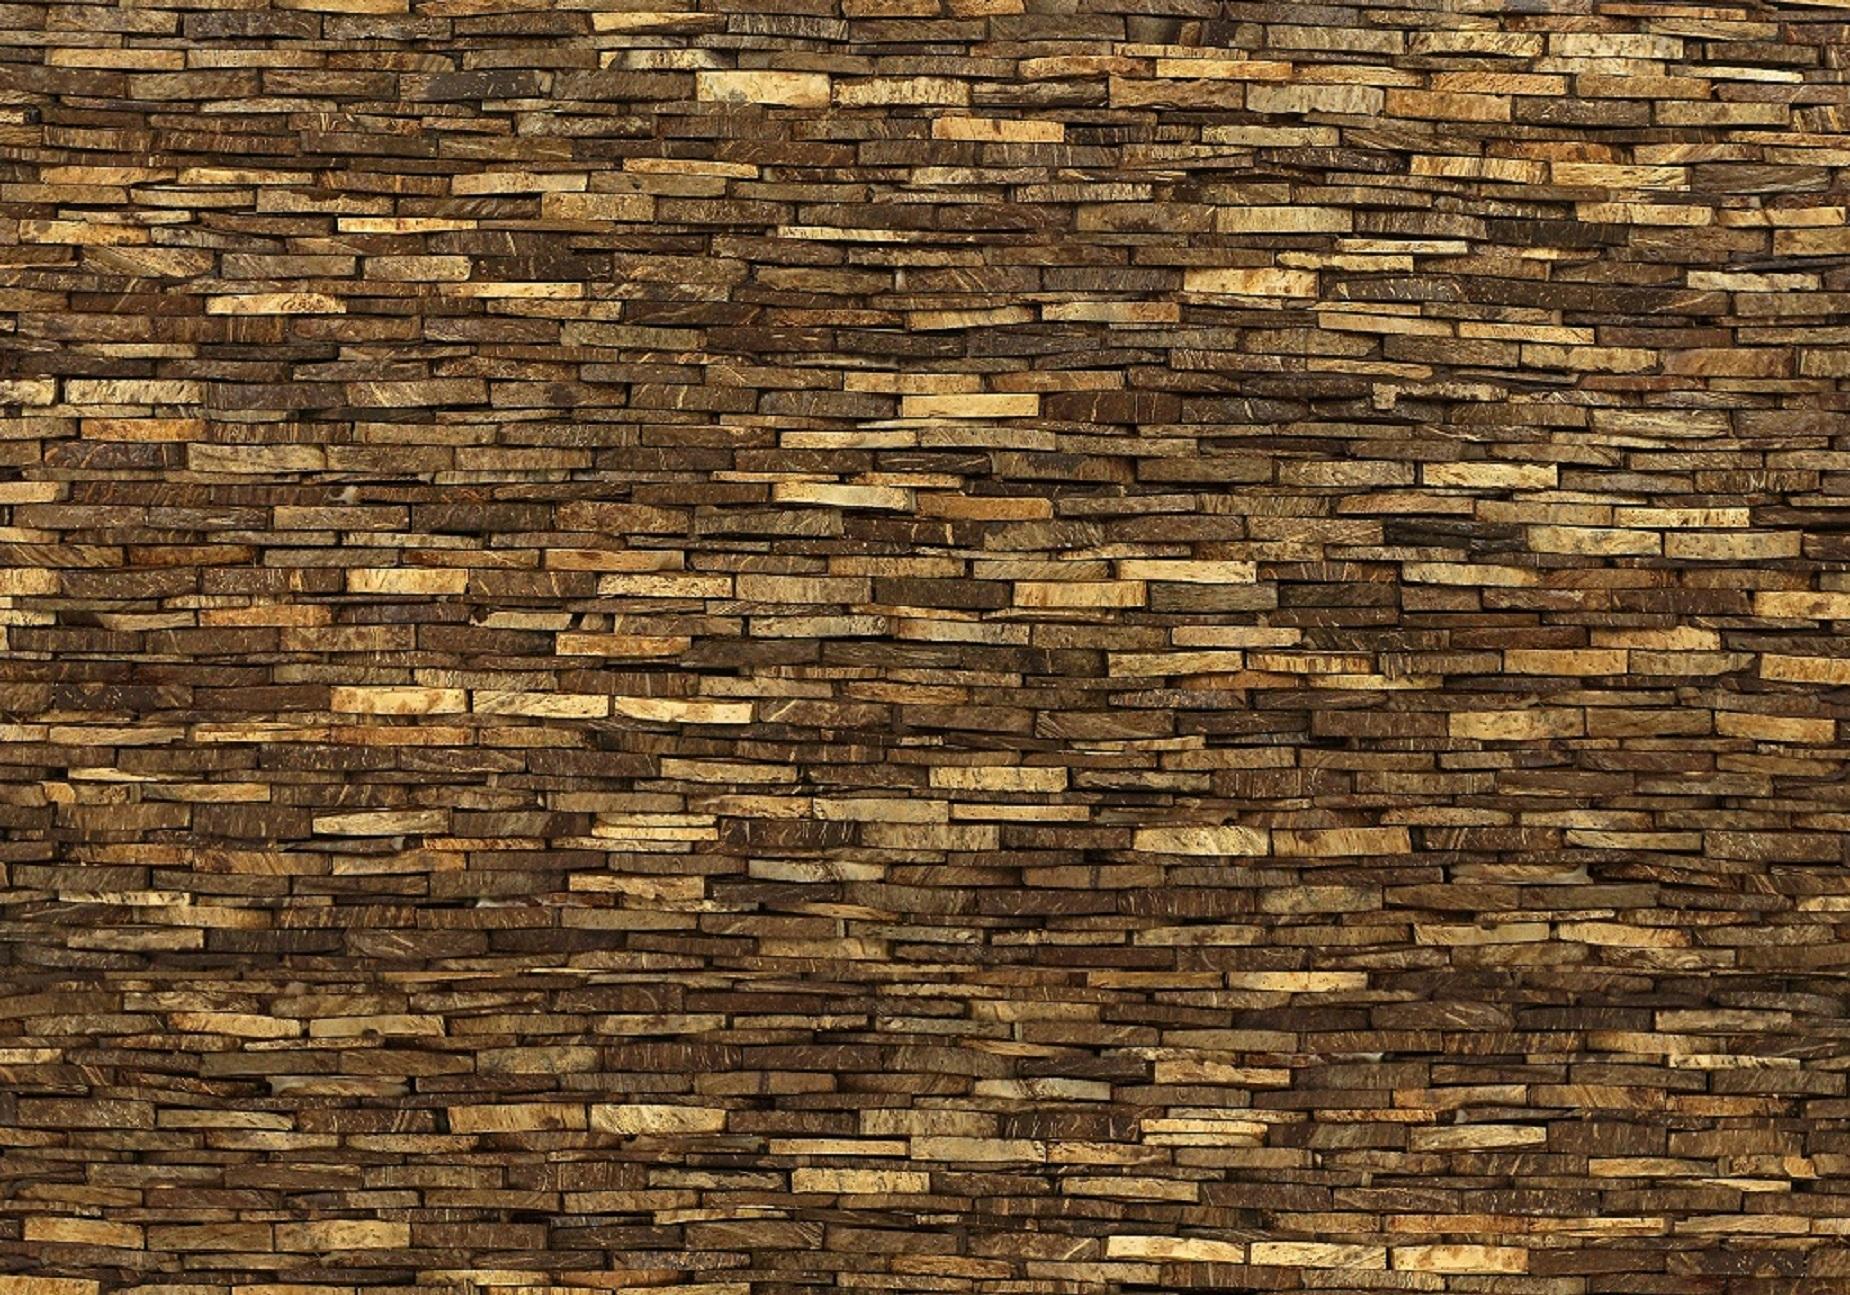 Bruine kleurenmix kokosnoot Omo Niha coco stone grain natural uit de Bungle Bungles collectie